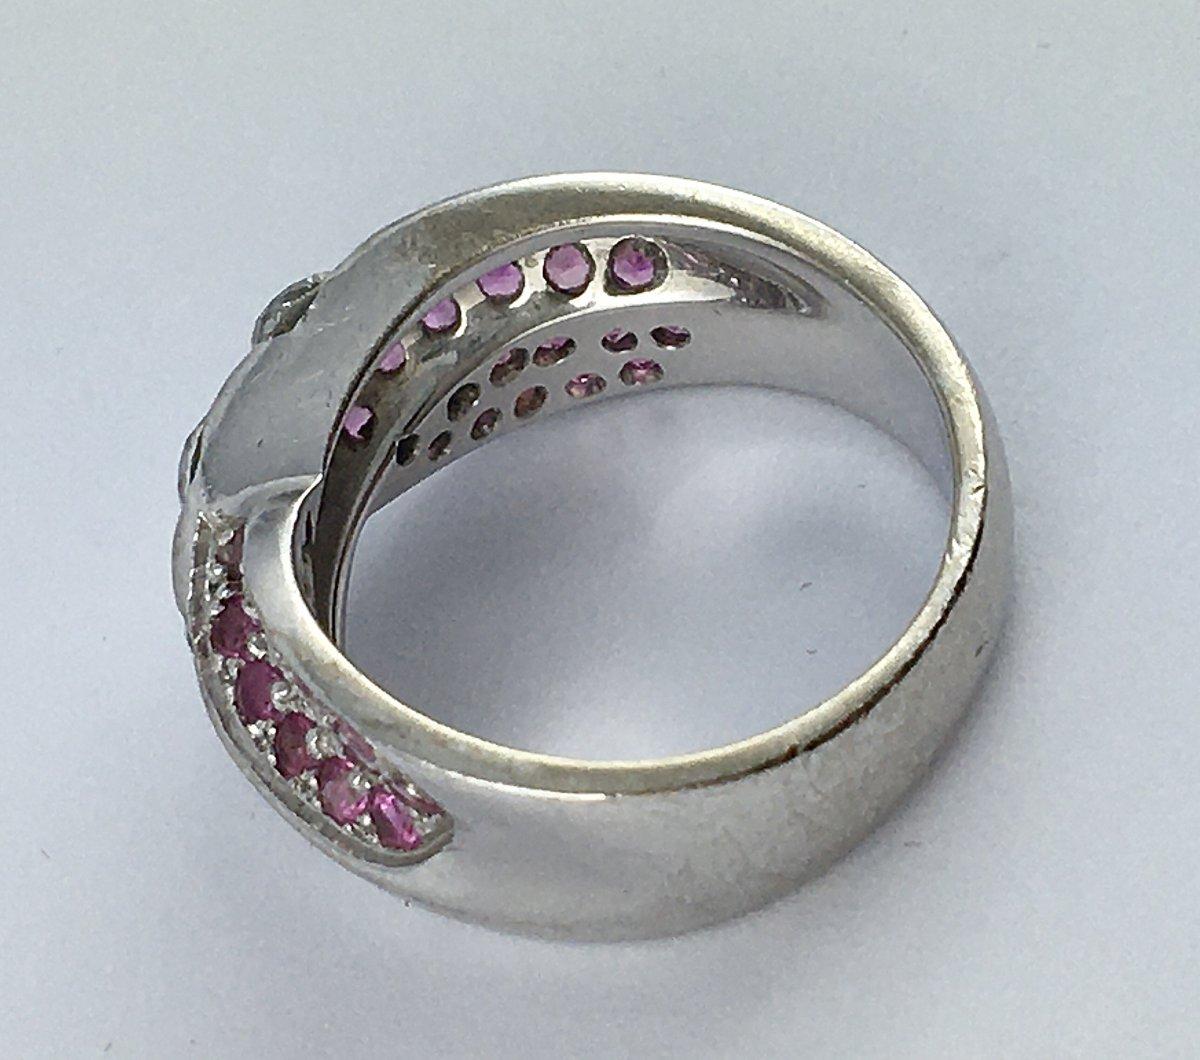 Bague Or Blanc Diamants Et Pavage Saphirs Roses-photo-6